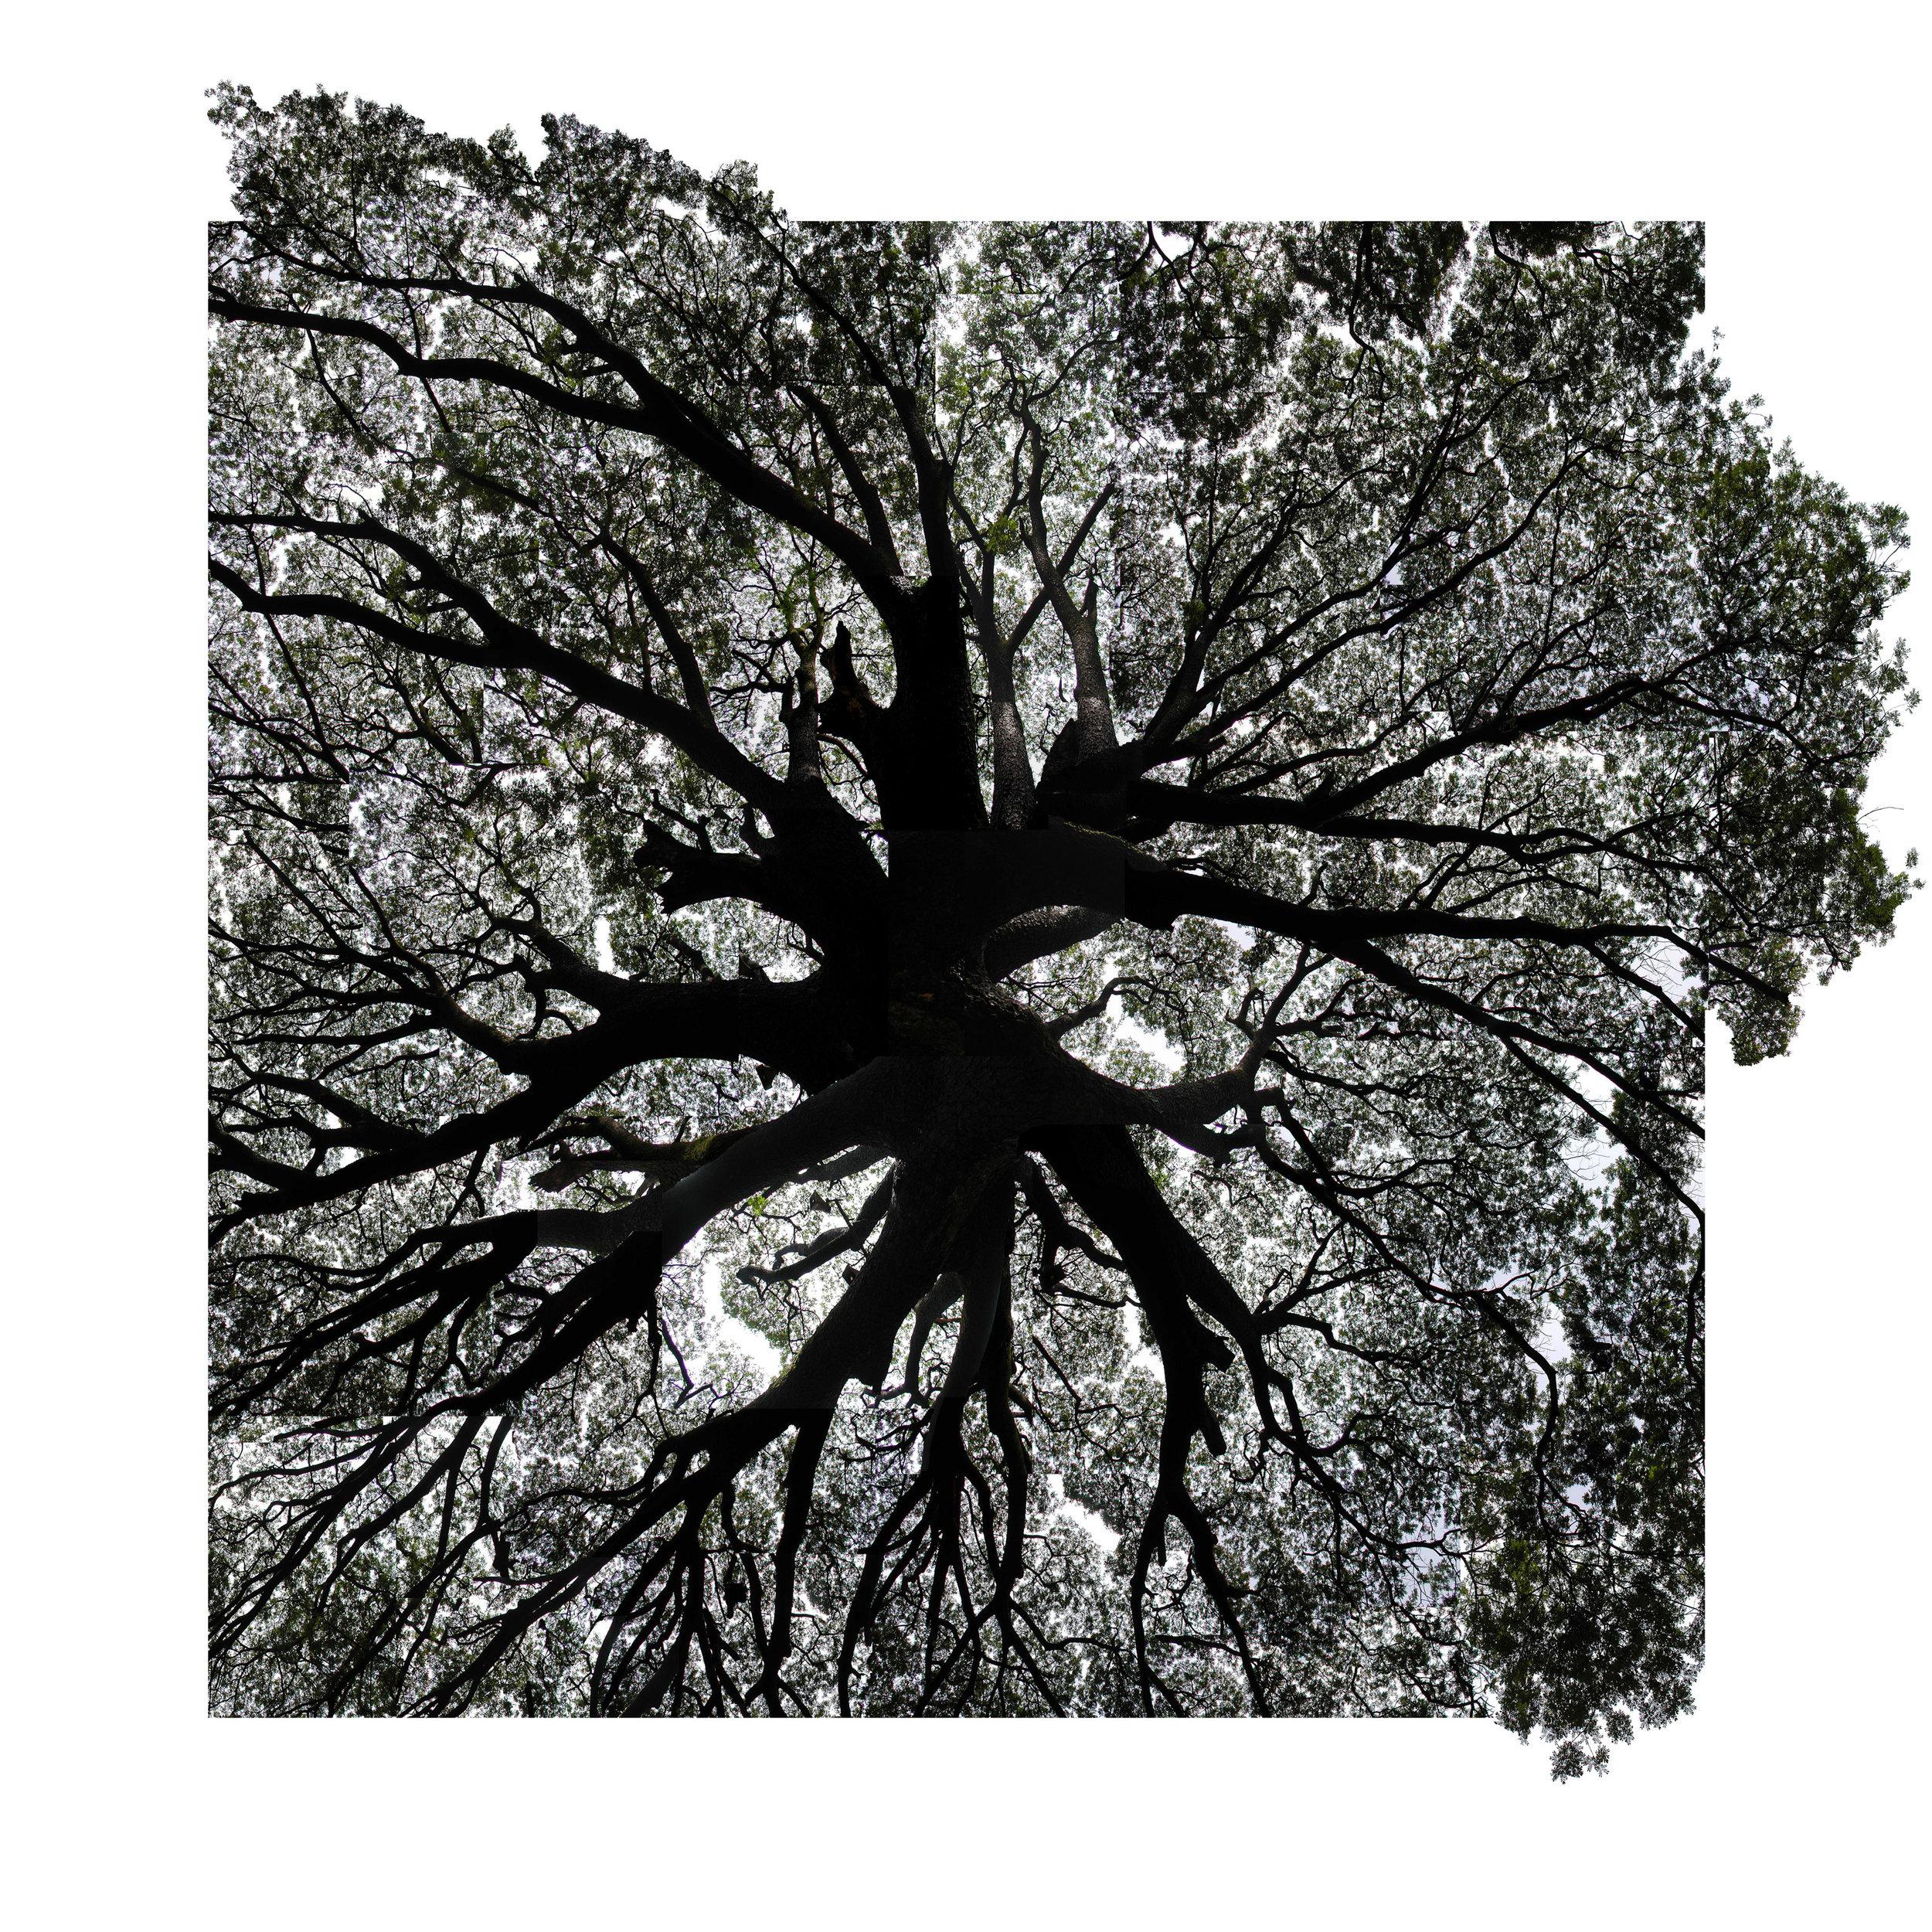 rain-tree-assembly-3-C.jpg